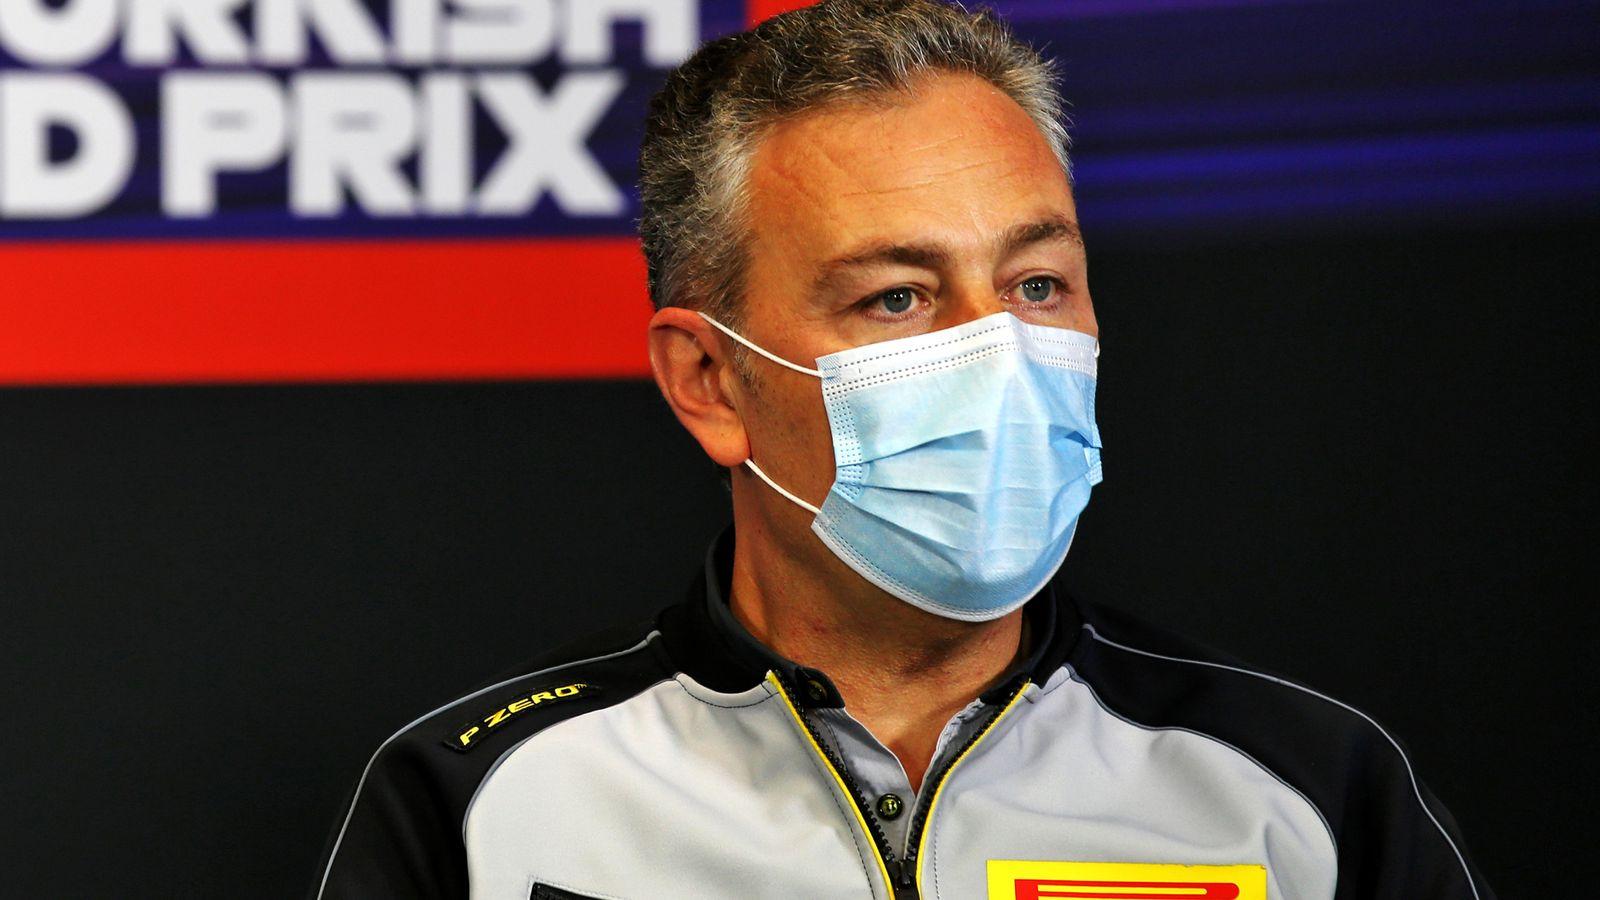 Pirelli F1 chief Mario Isola tests positive for Covid-19 ...